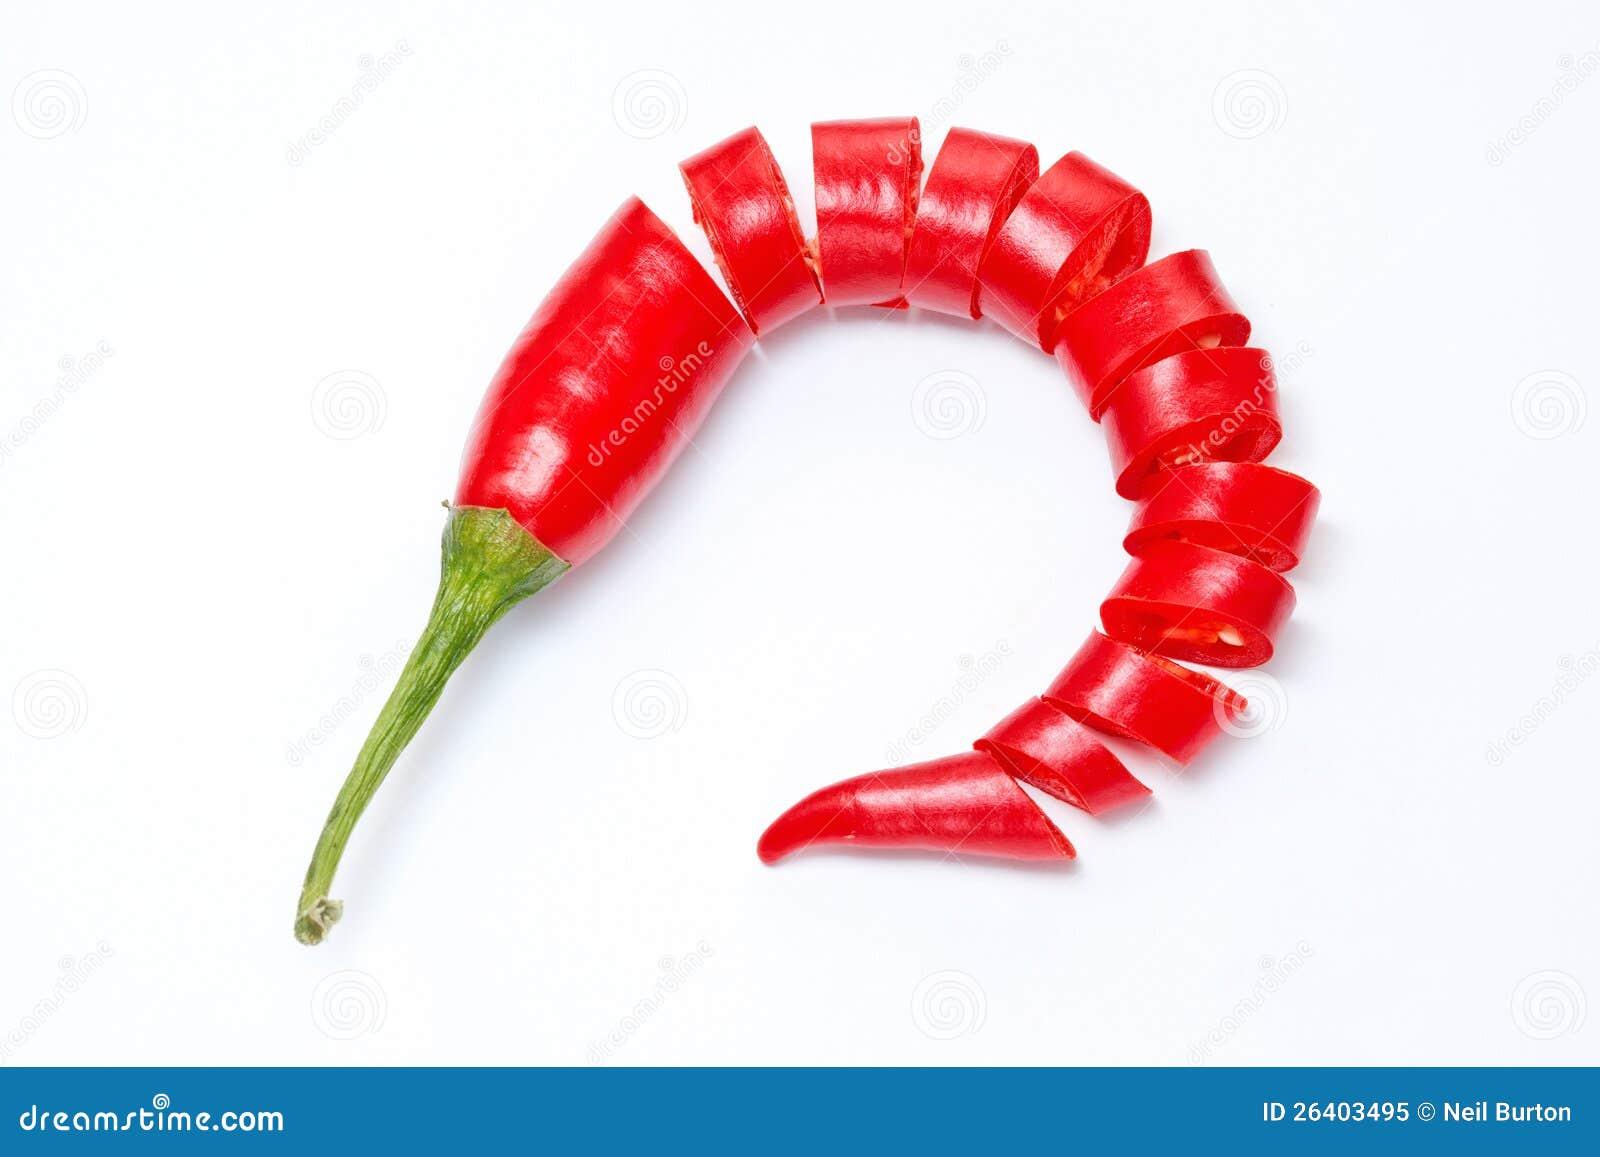 Sliced red chilli